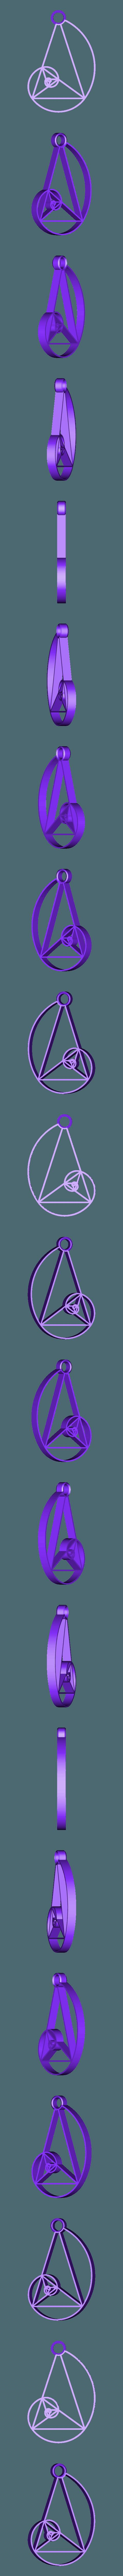 LogaSpiral50mm.stl Download free STL file Logarithmic Spiral, Golden Triangle, Golden Gnomon, Spira Mirabilis • 3D print object, LGBU